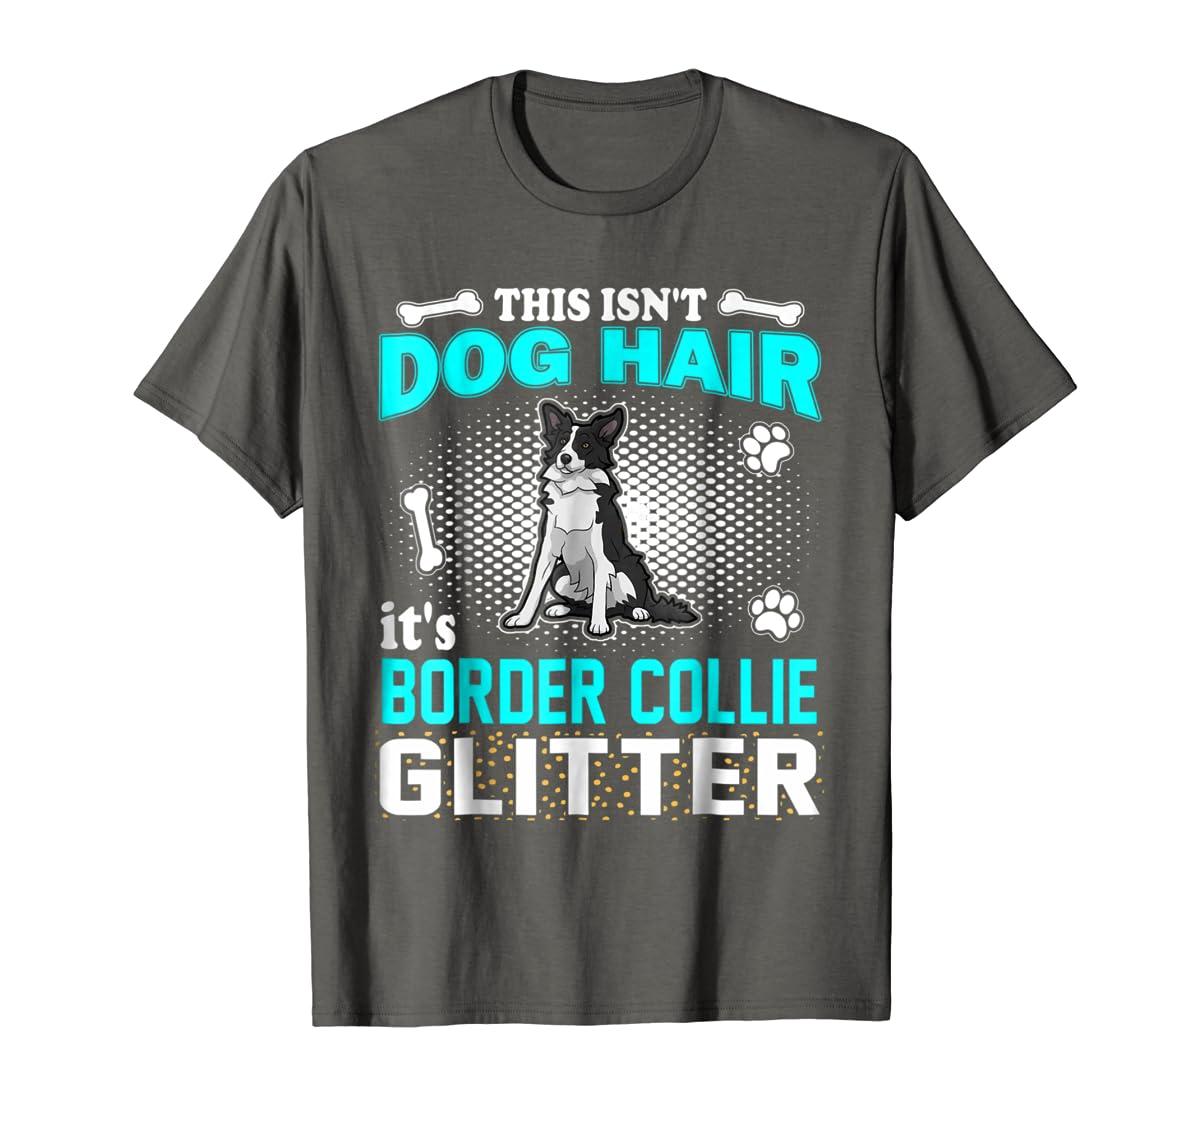 This Isn't Dog Hair It's Border Collie Glitter T-Shirt-Men's T-Shirt-Dark Heather